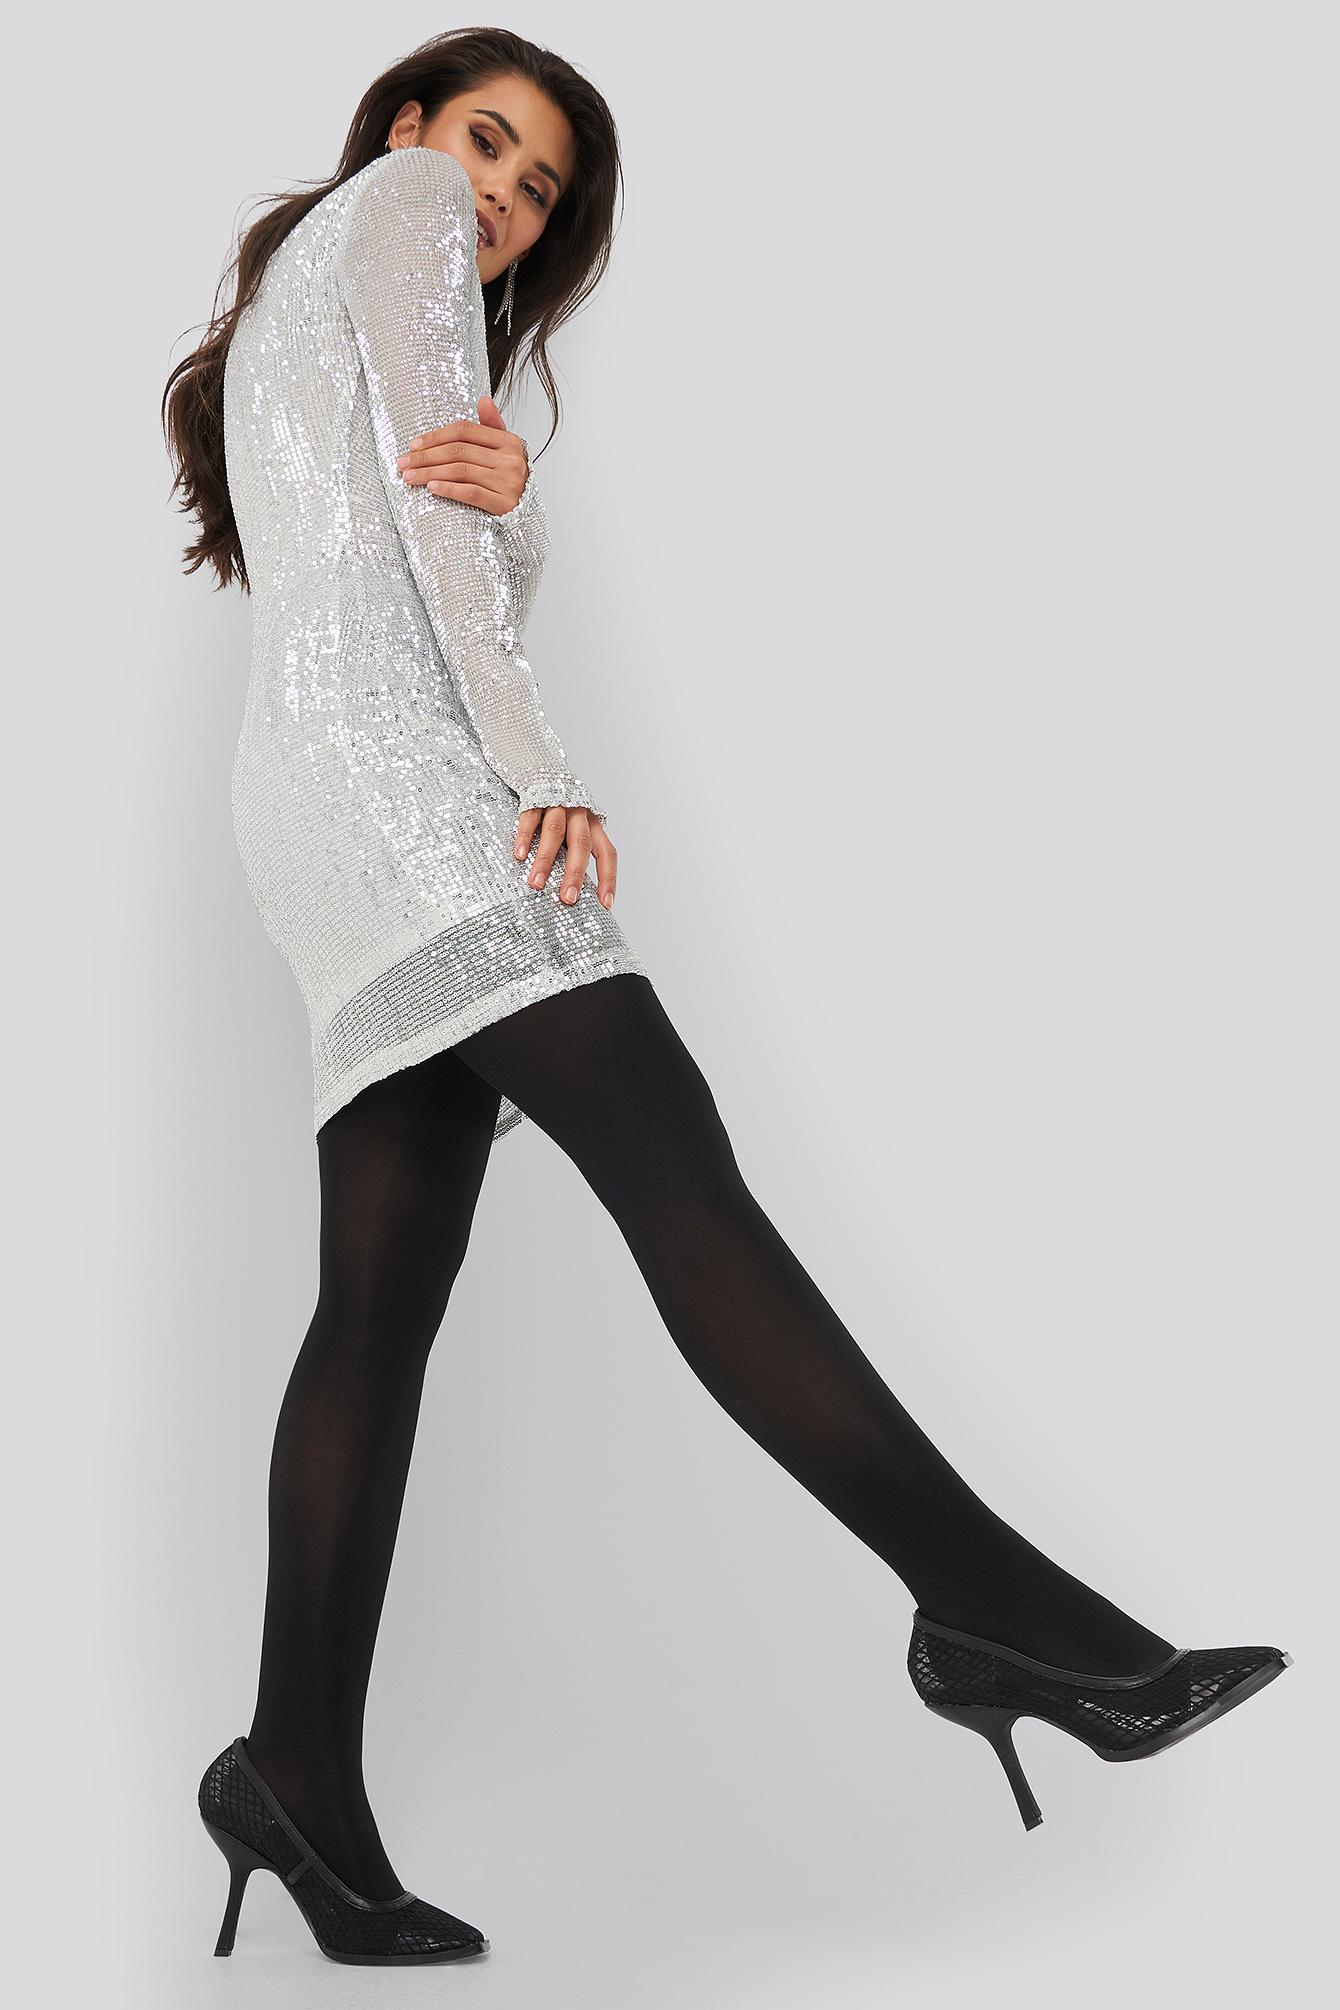 na-kd party -  Sequin Round Neck Mini Dress - Silver